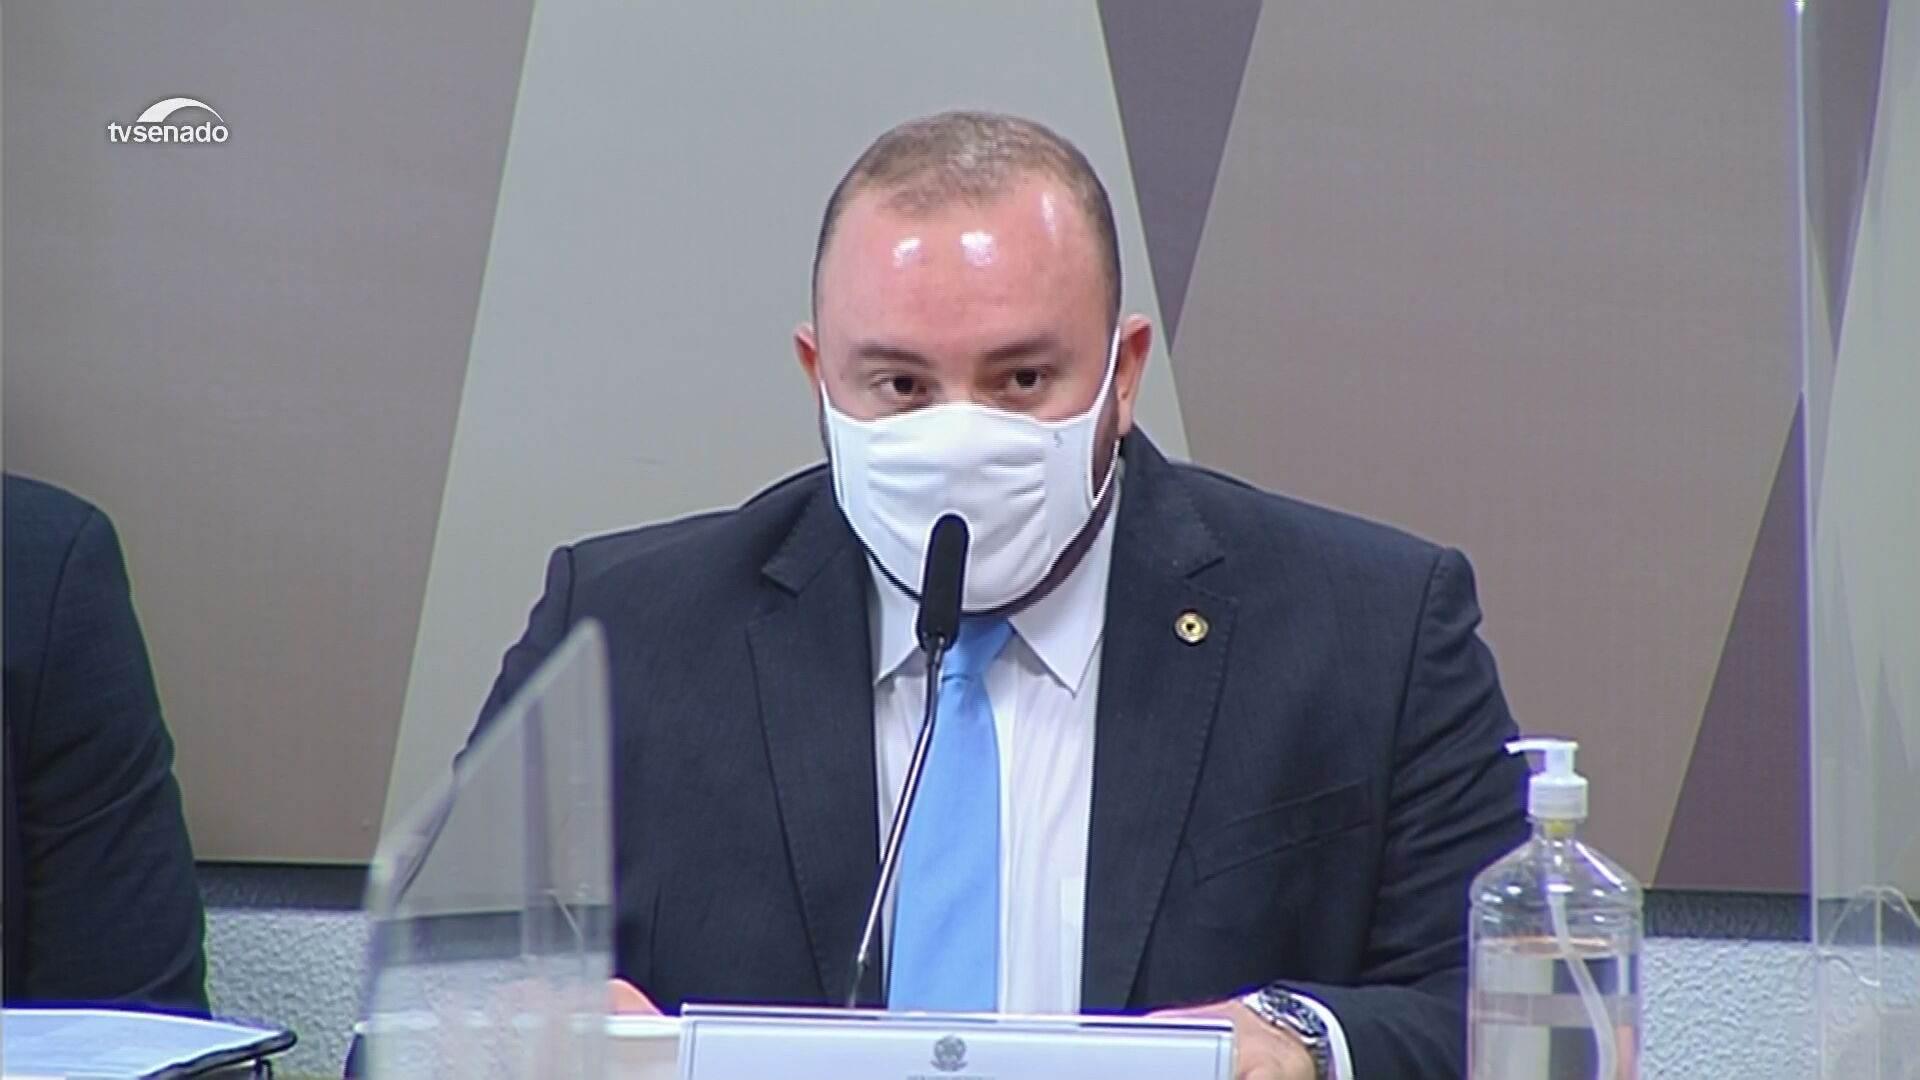 Deputado estadual do Amazonas Fausto Vieira dos Santos Junior (MDB)